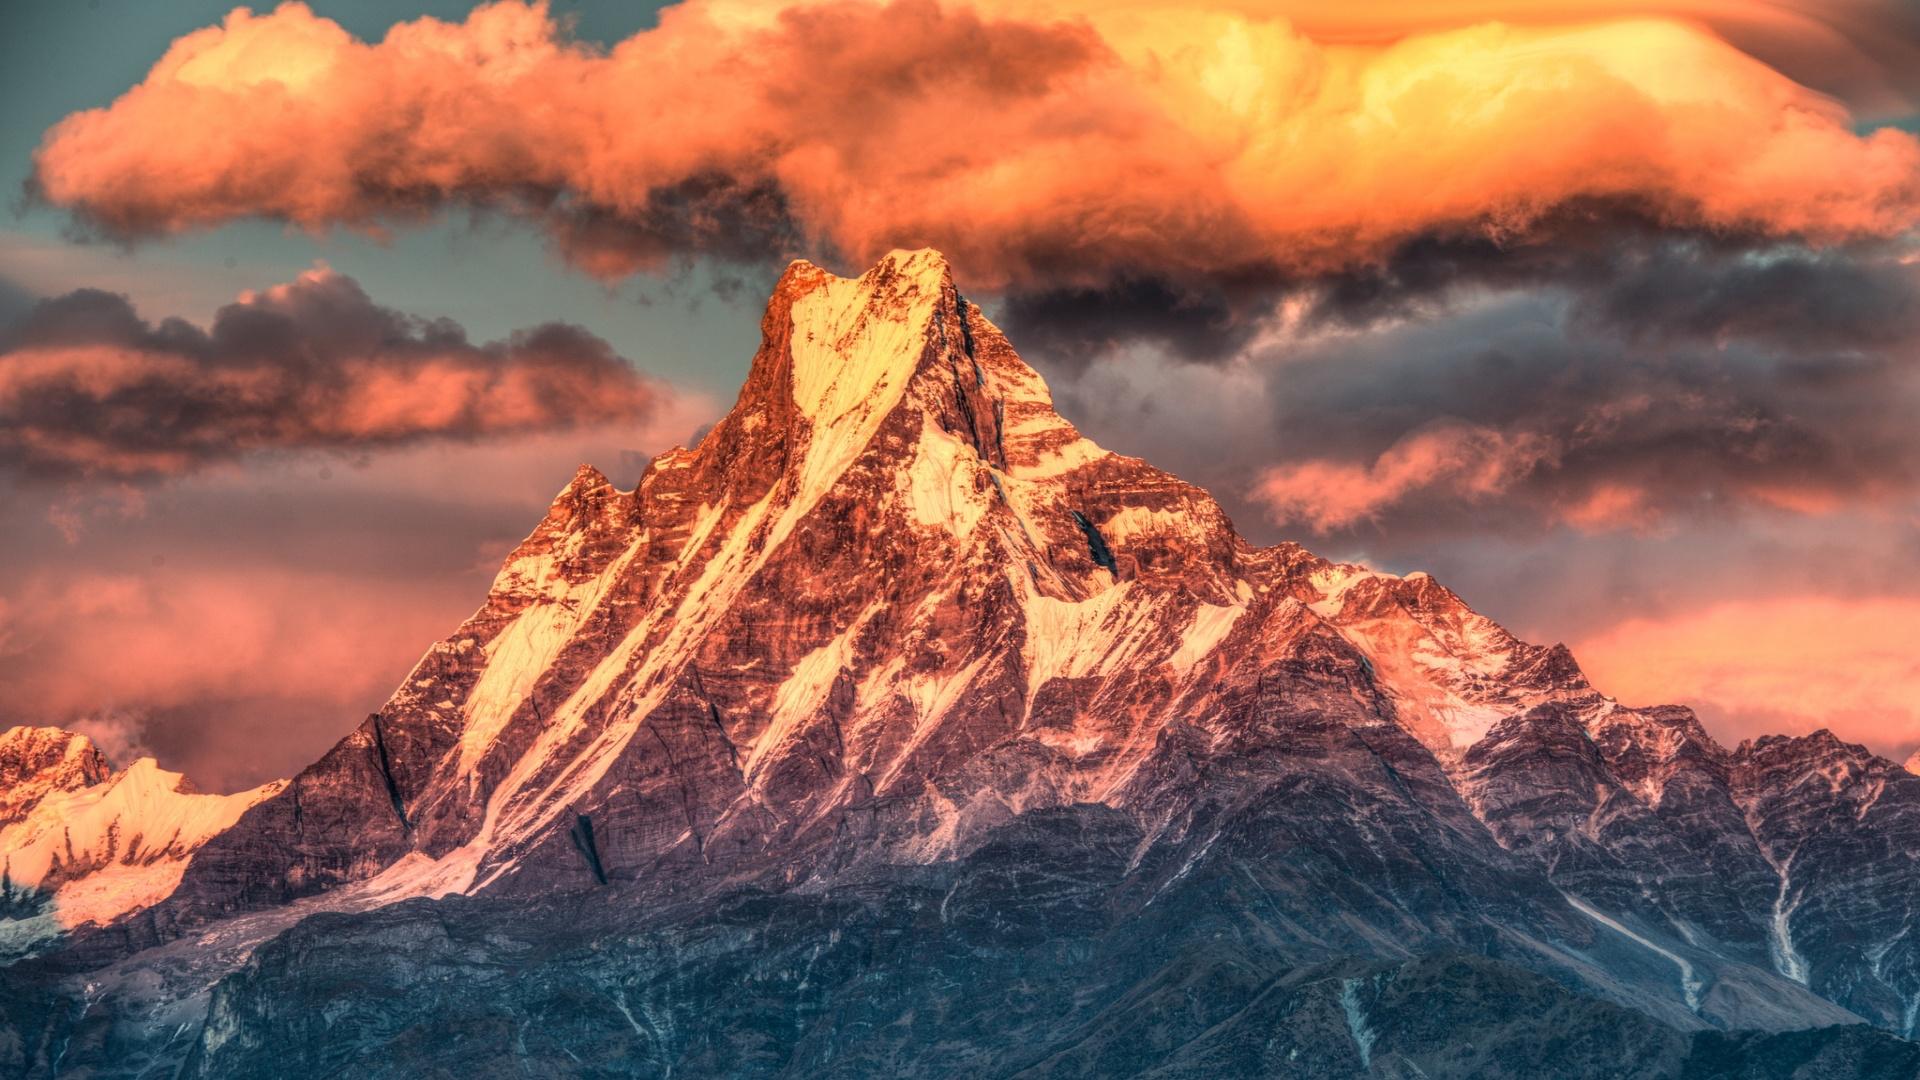 Himalayas hd wallpaper background image 1920x1080 id - Himalaya pictures wallpaper ...